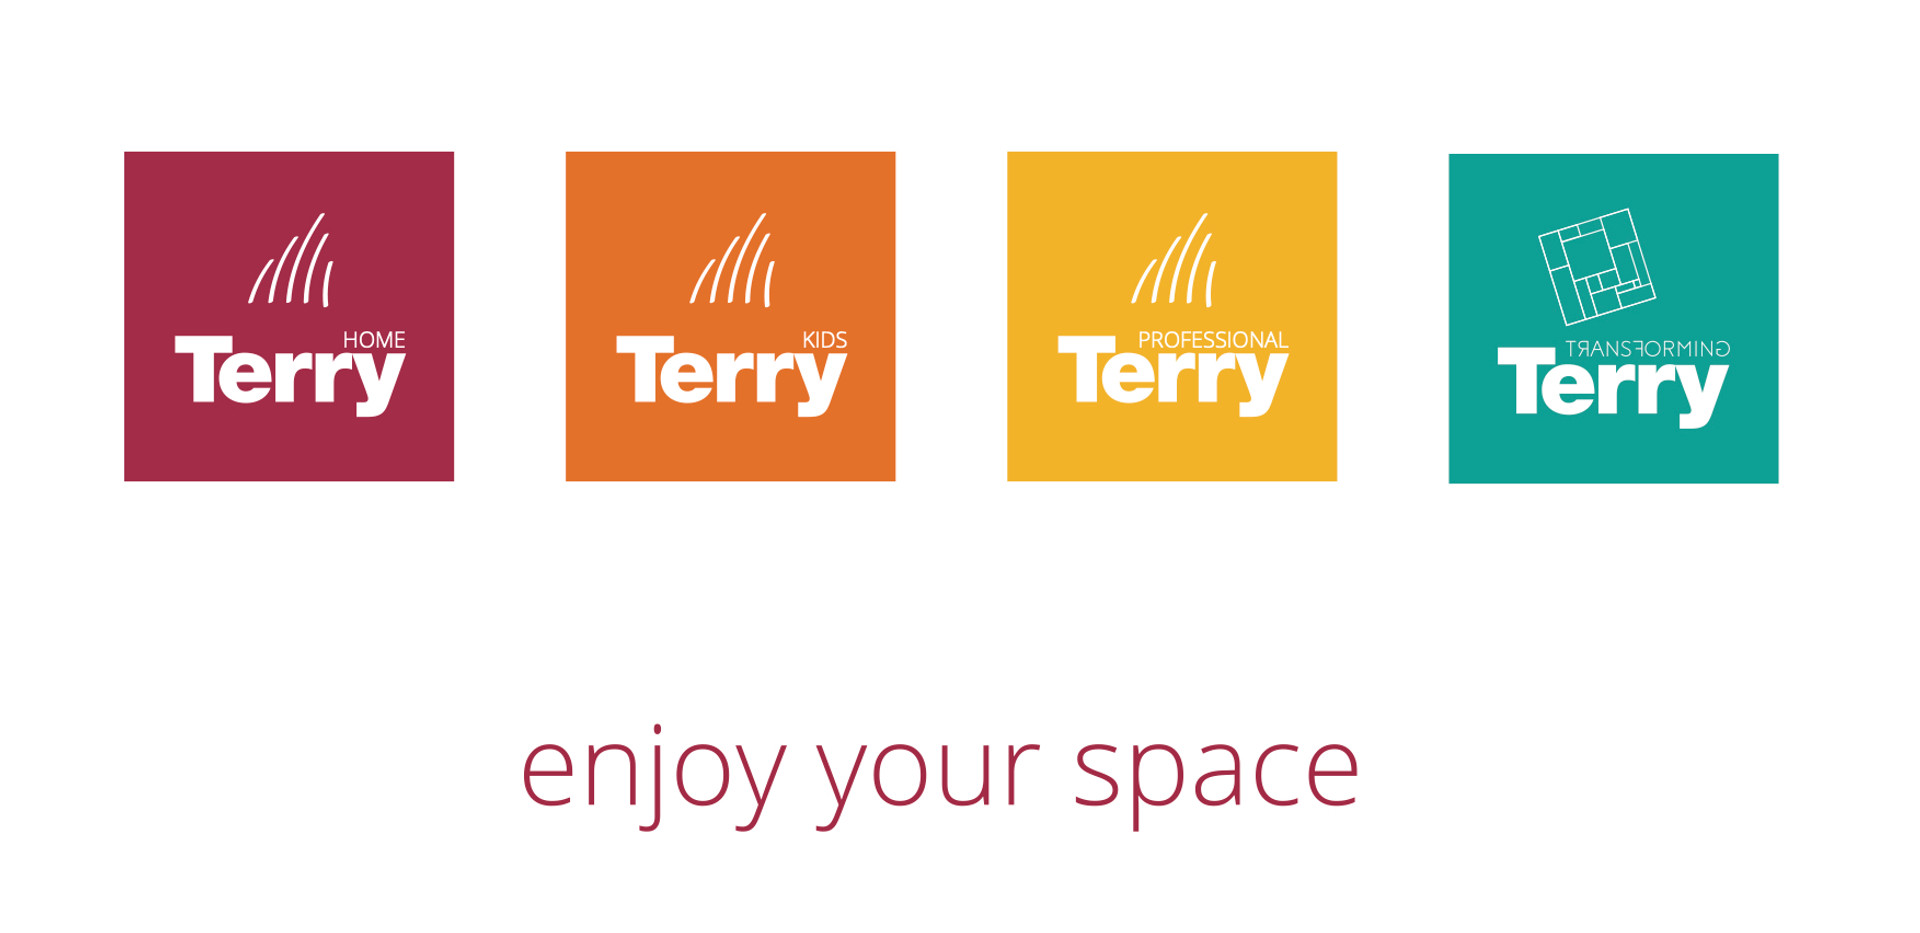 Terry Storage - Corporate